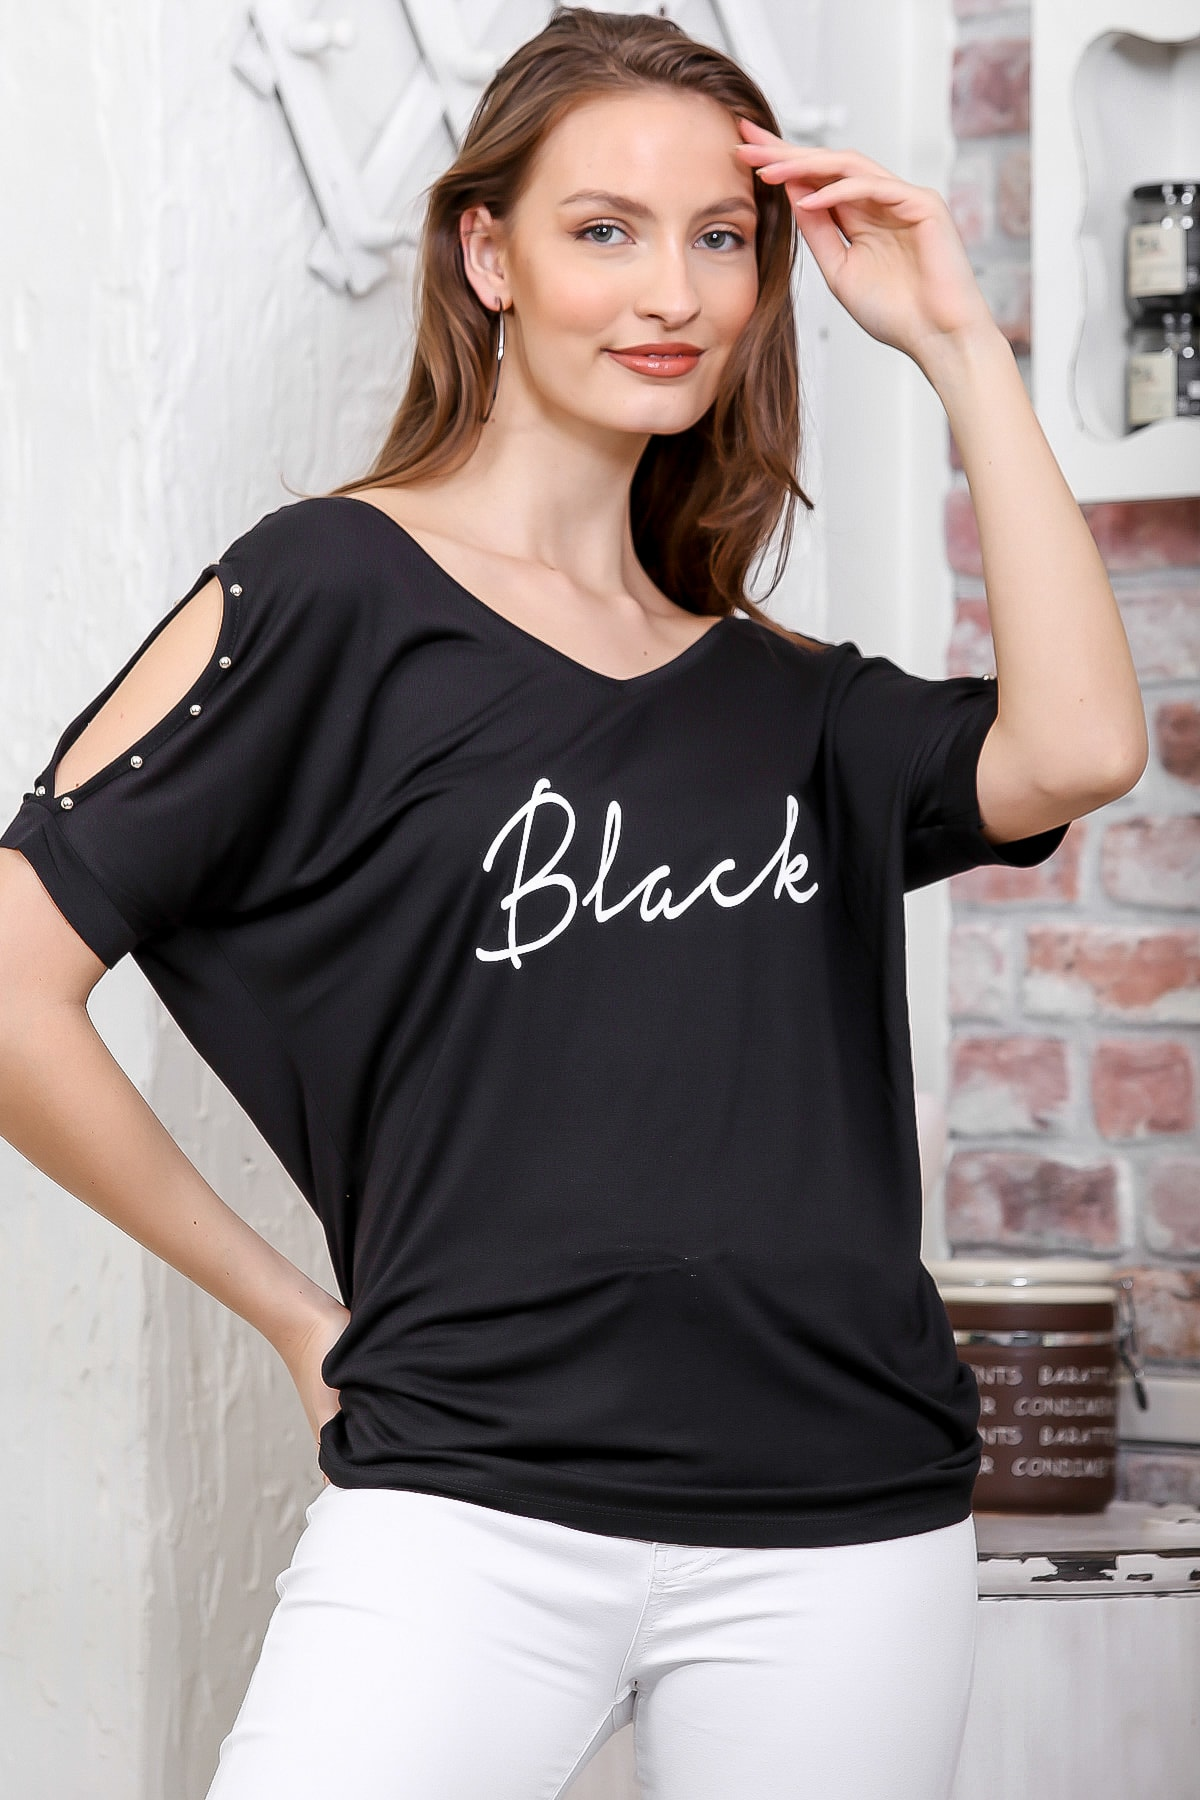 Chiccy Kadın Siyah Ön Arka V Yaka Omuz Pencereli Baskılı T-Shirt M10010300TS98278 0